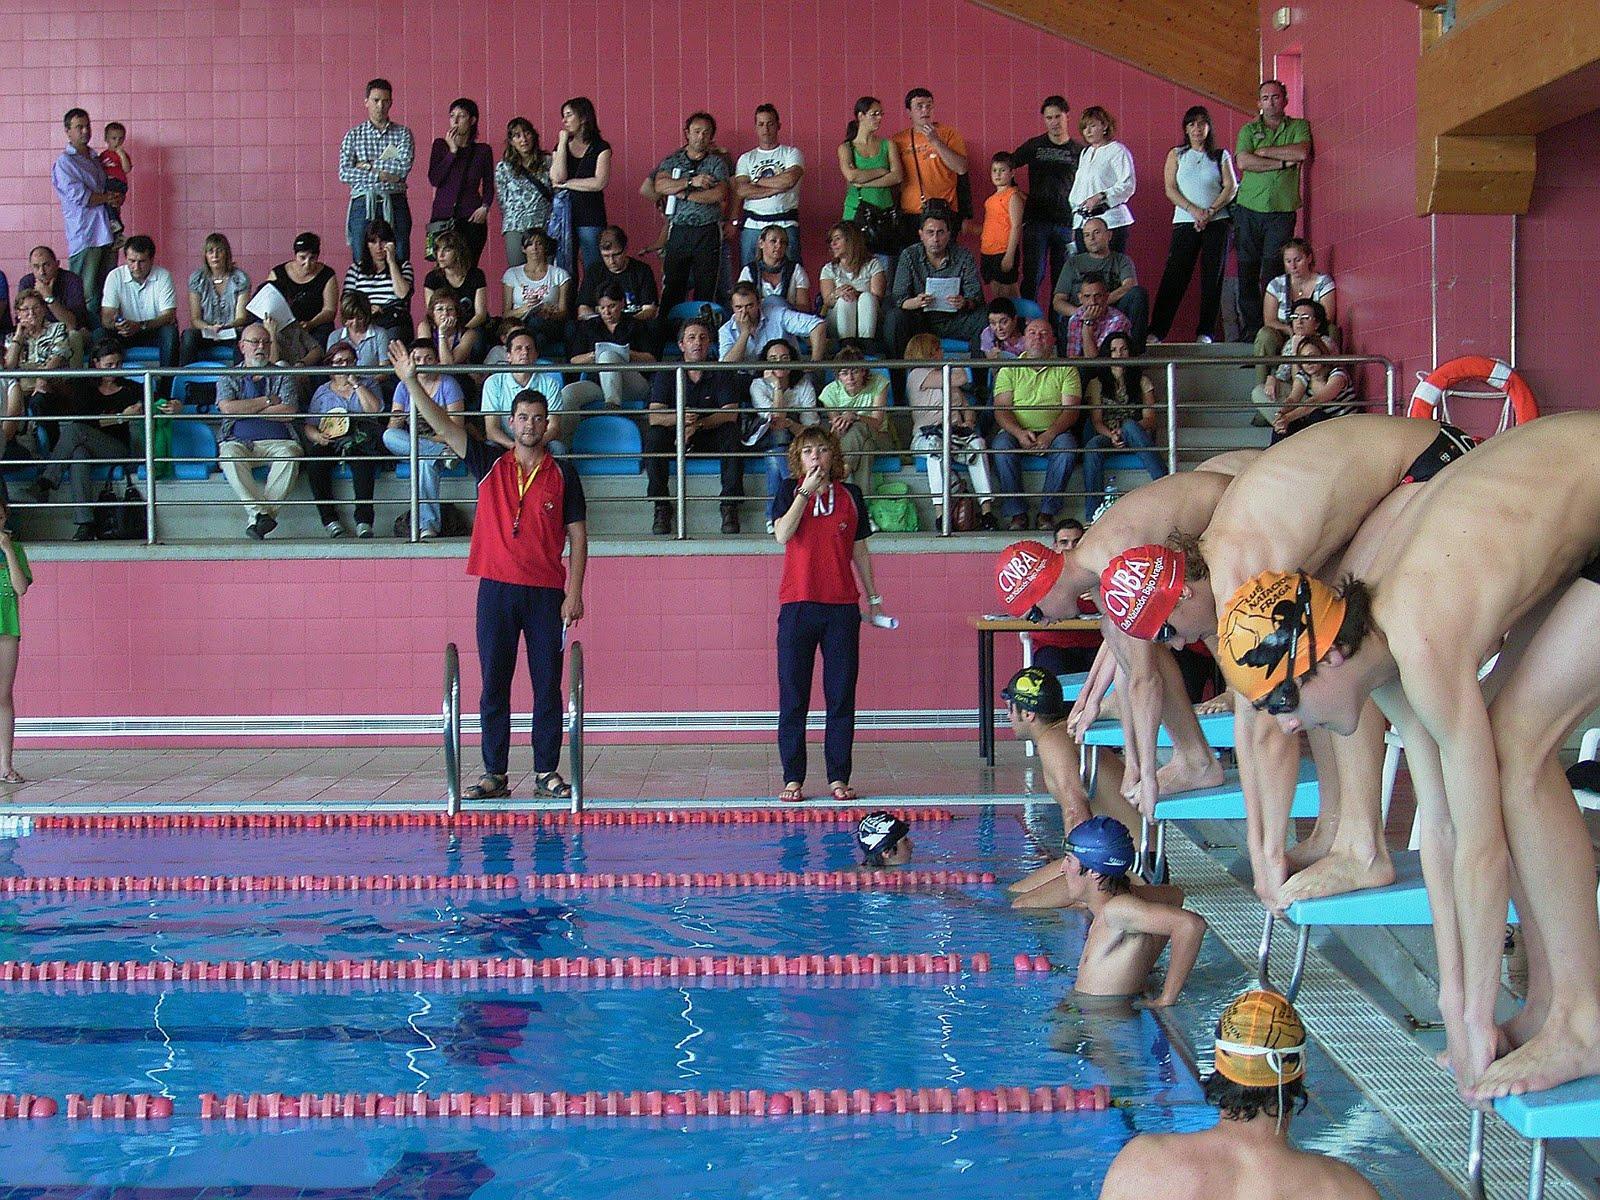 Club nataci n bajo arag n 4 jornada fan en monz n for Piscinas de monzon